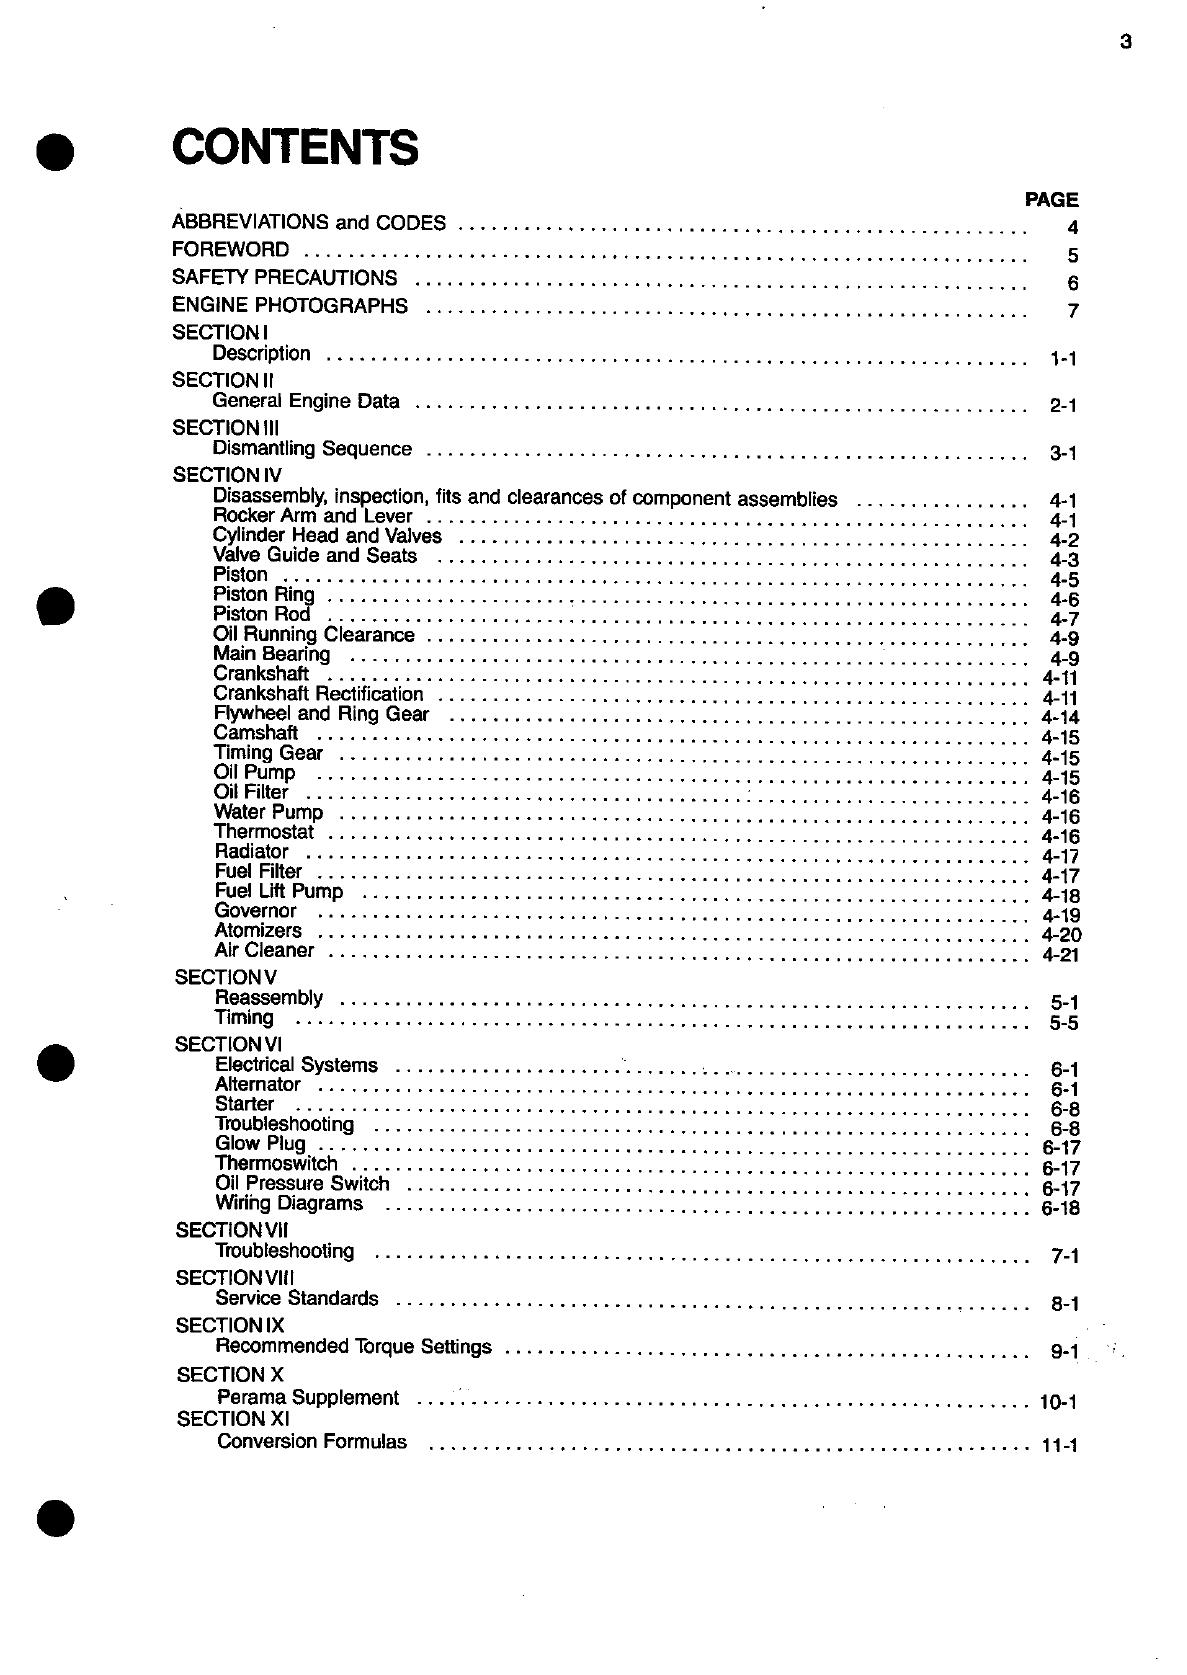 Kuhn Rikon Corp. Automobile Parts 8124 PERKINS ENGINE